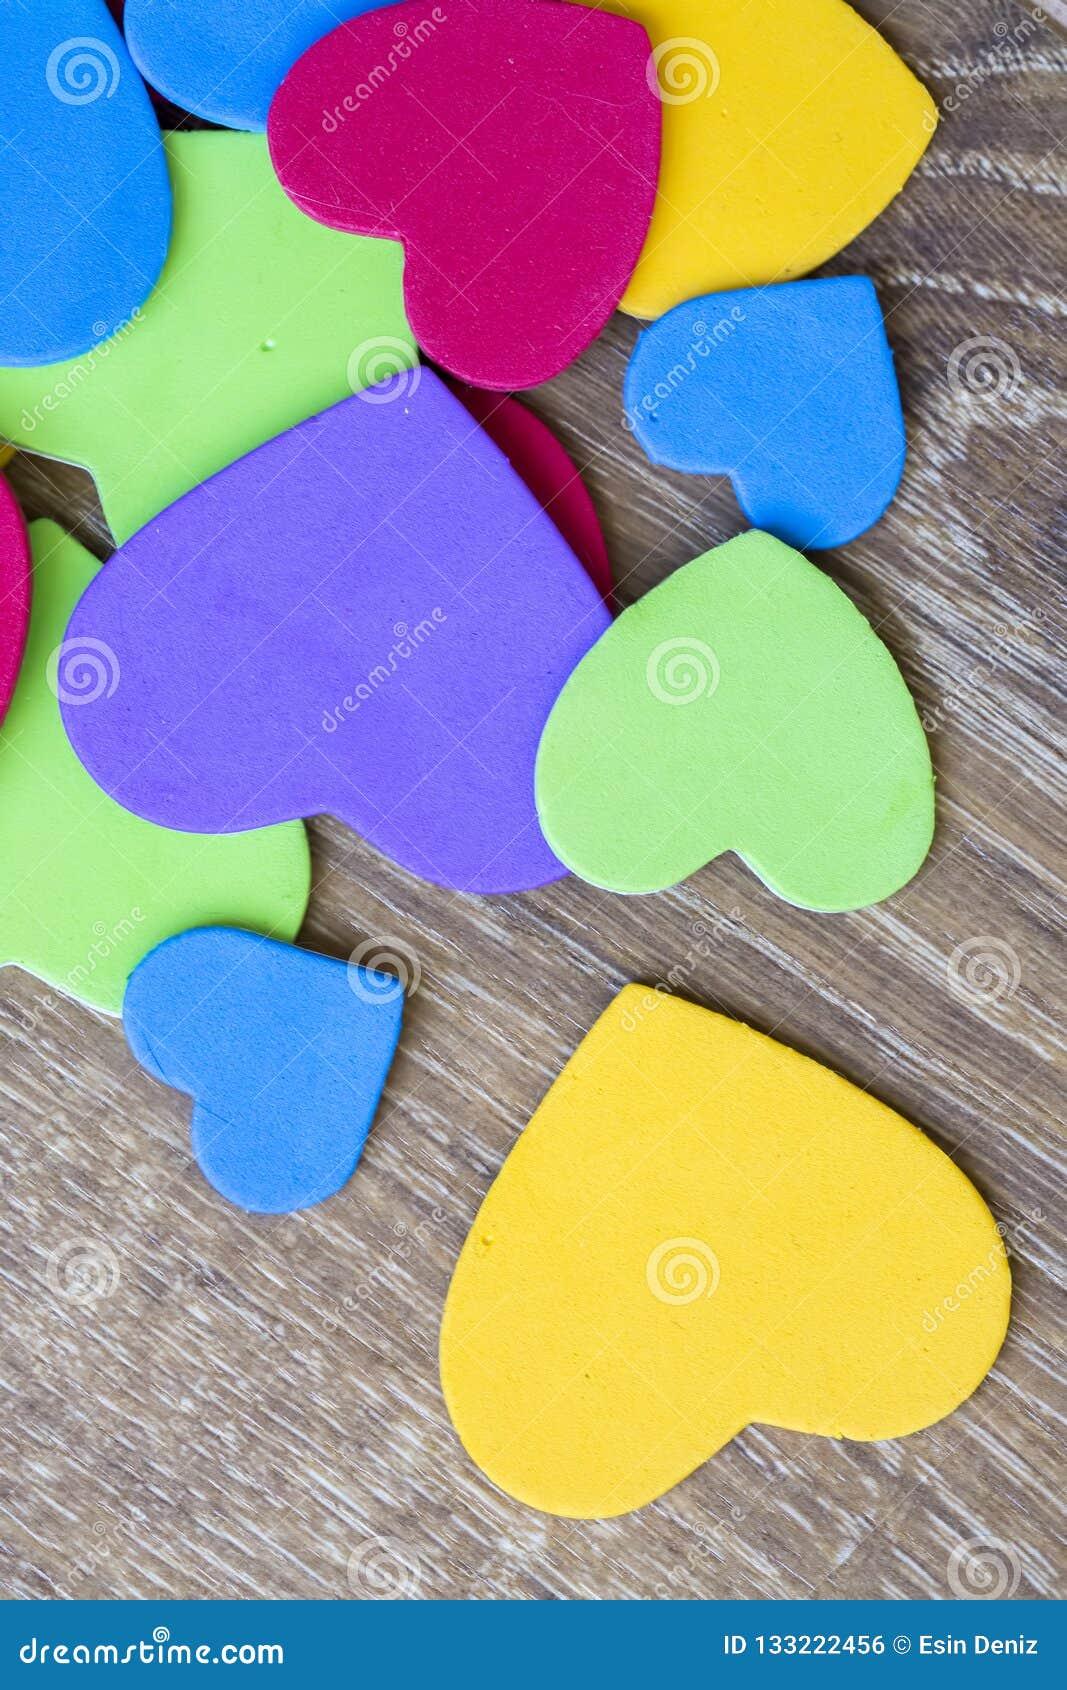 Colorful heart figure. Love symbol concept